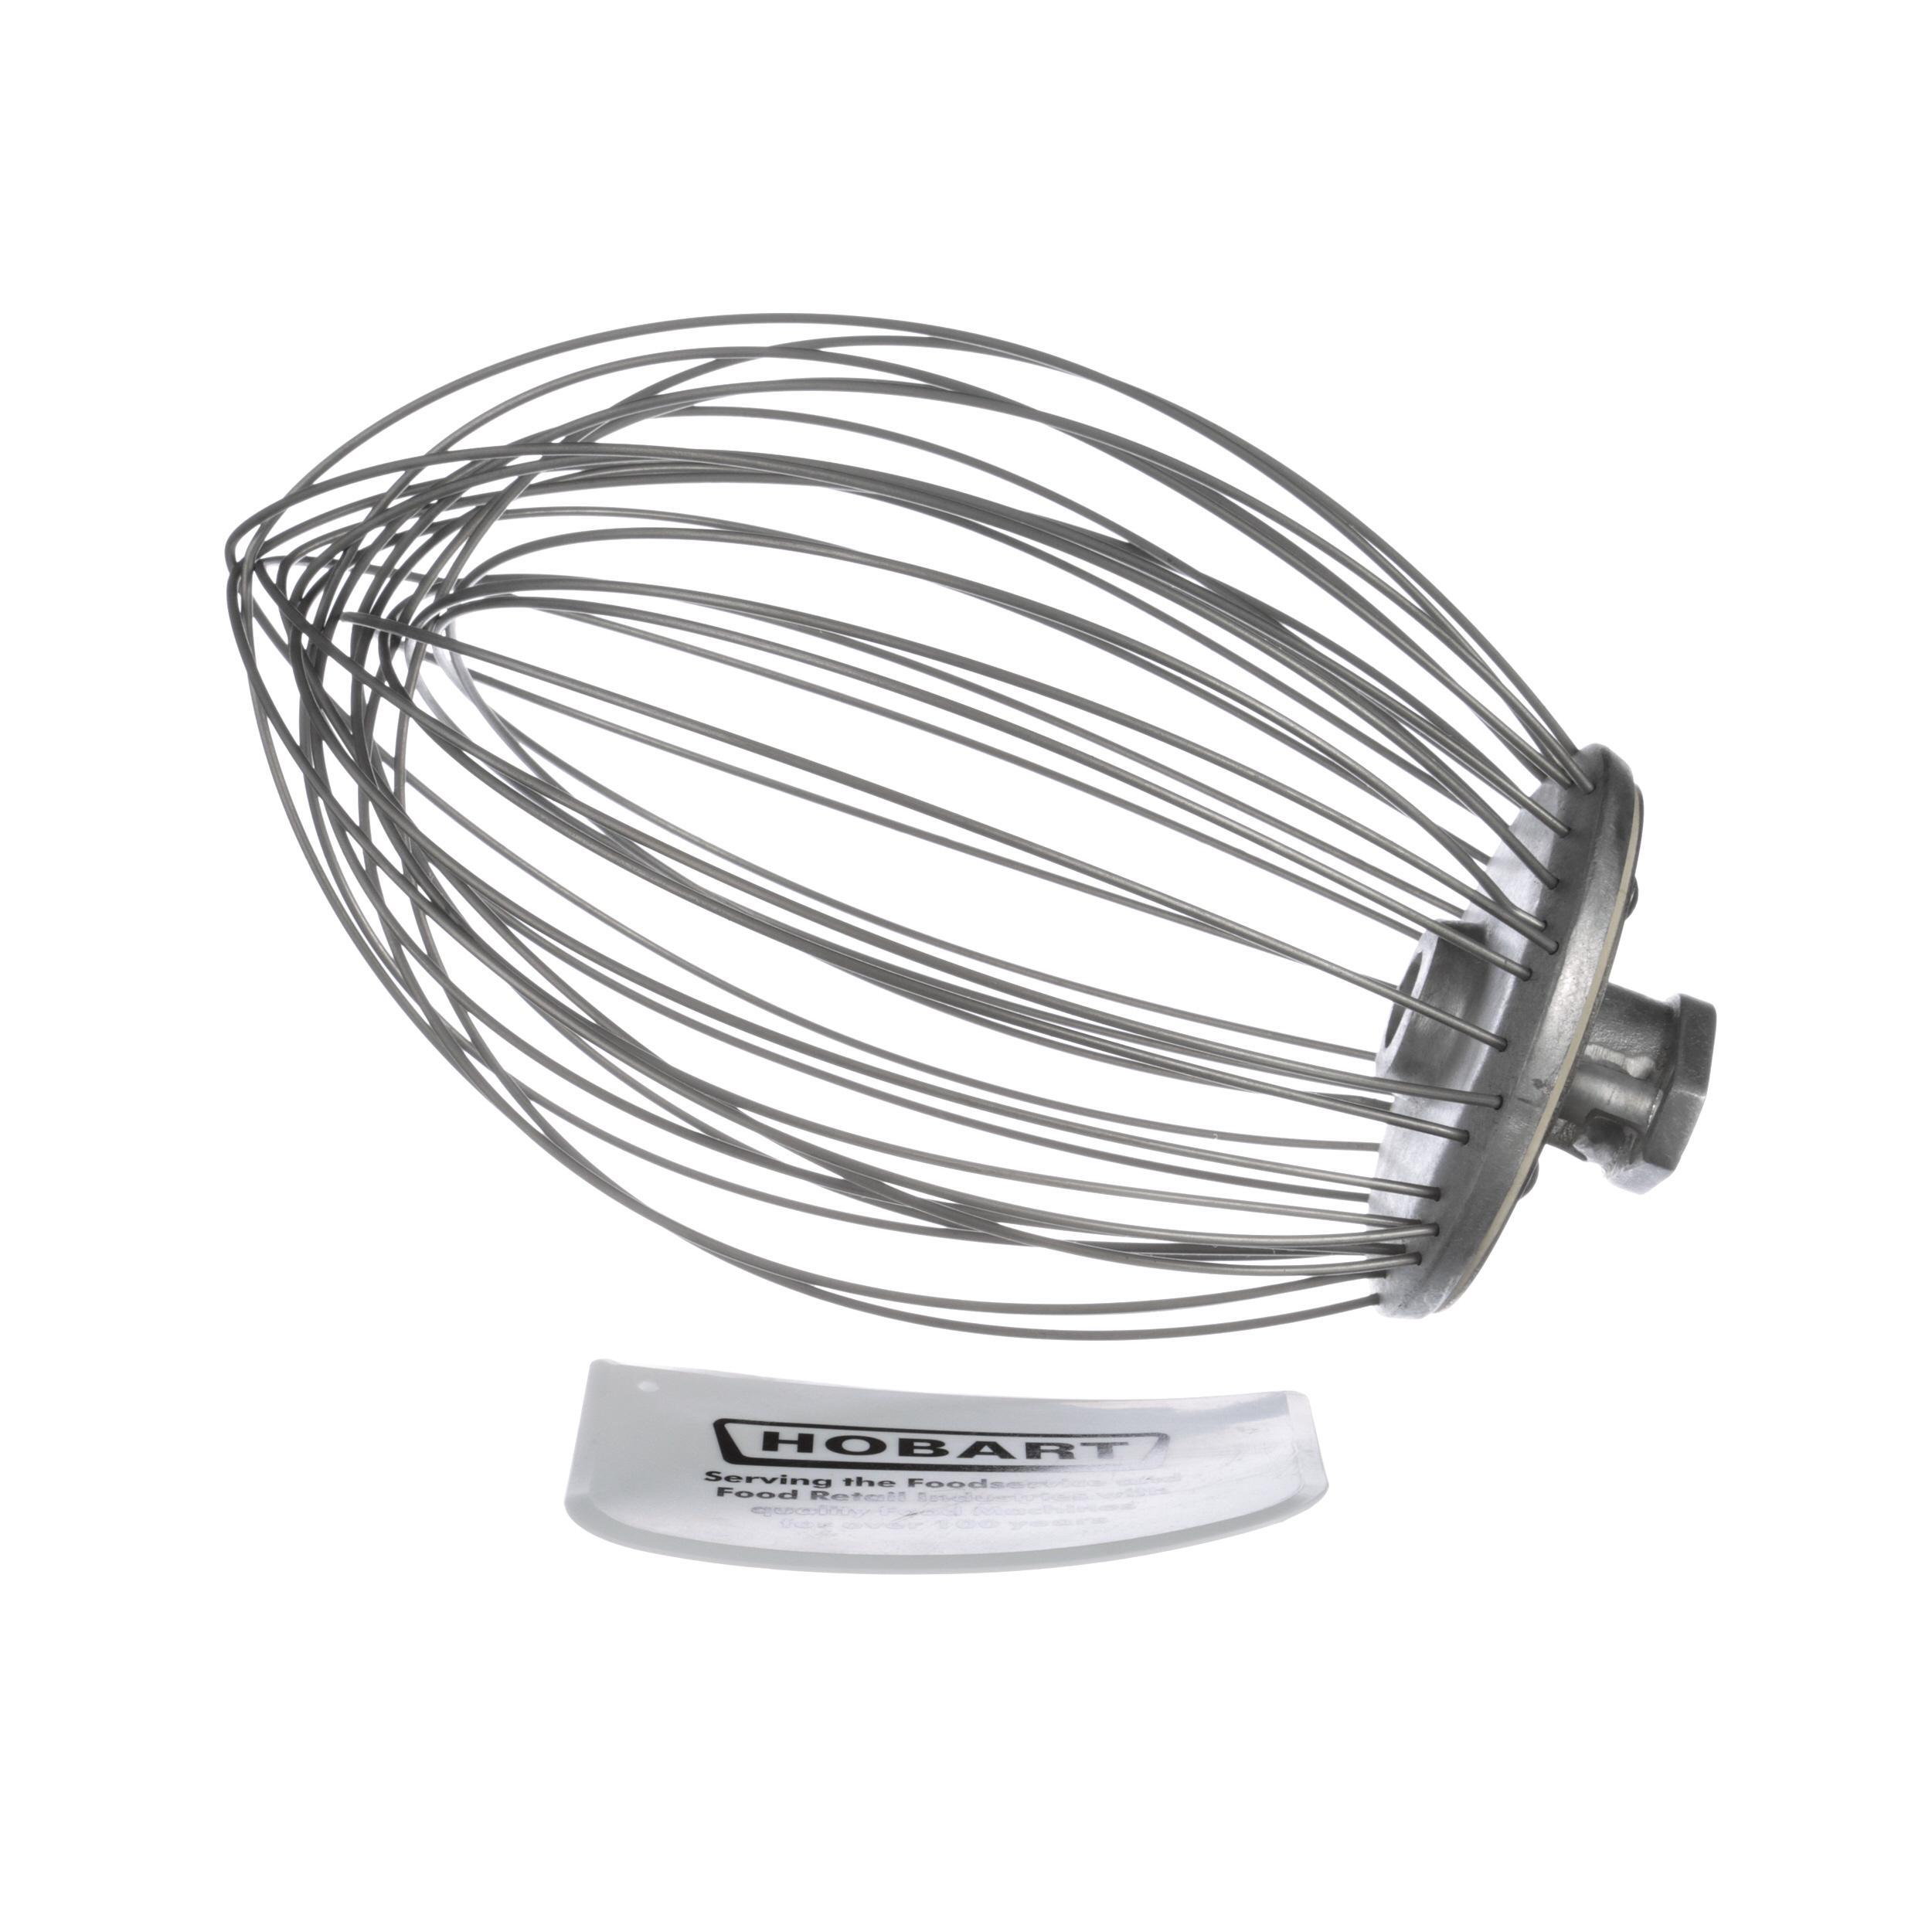 hobart wire whip d 20qt part 00275897